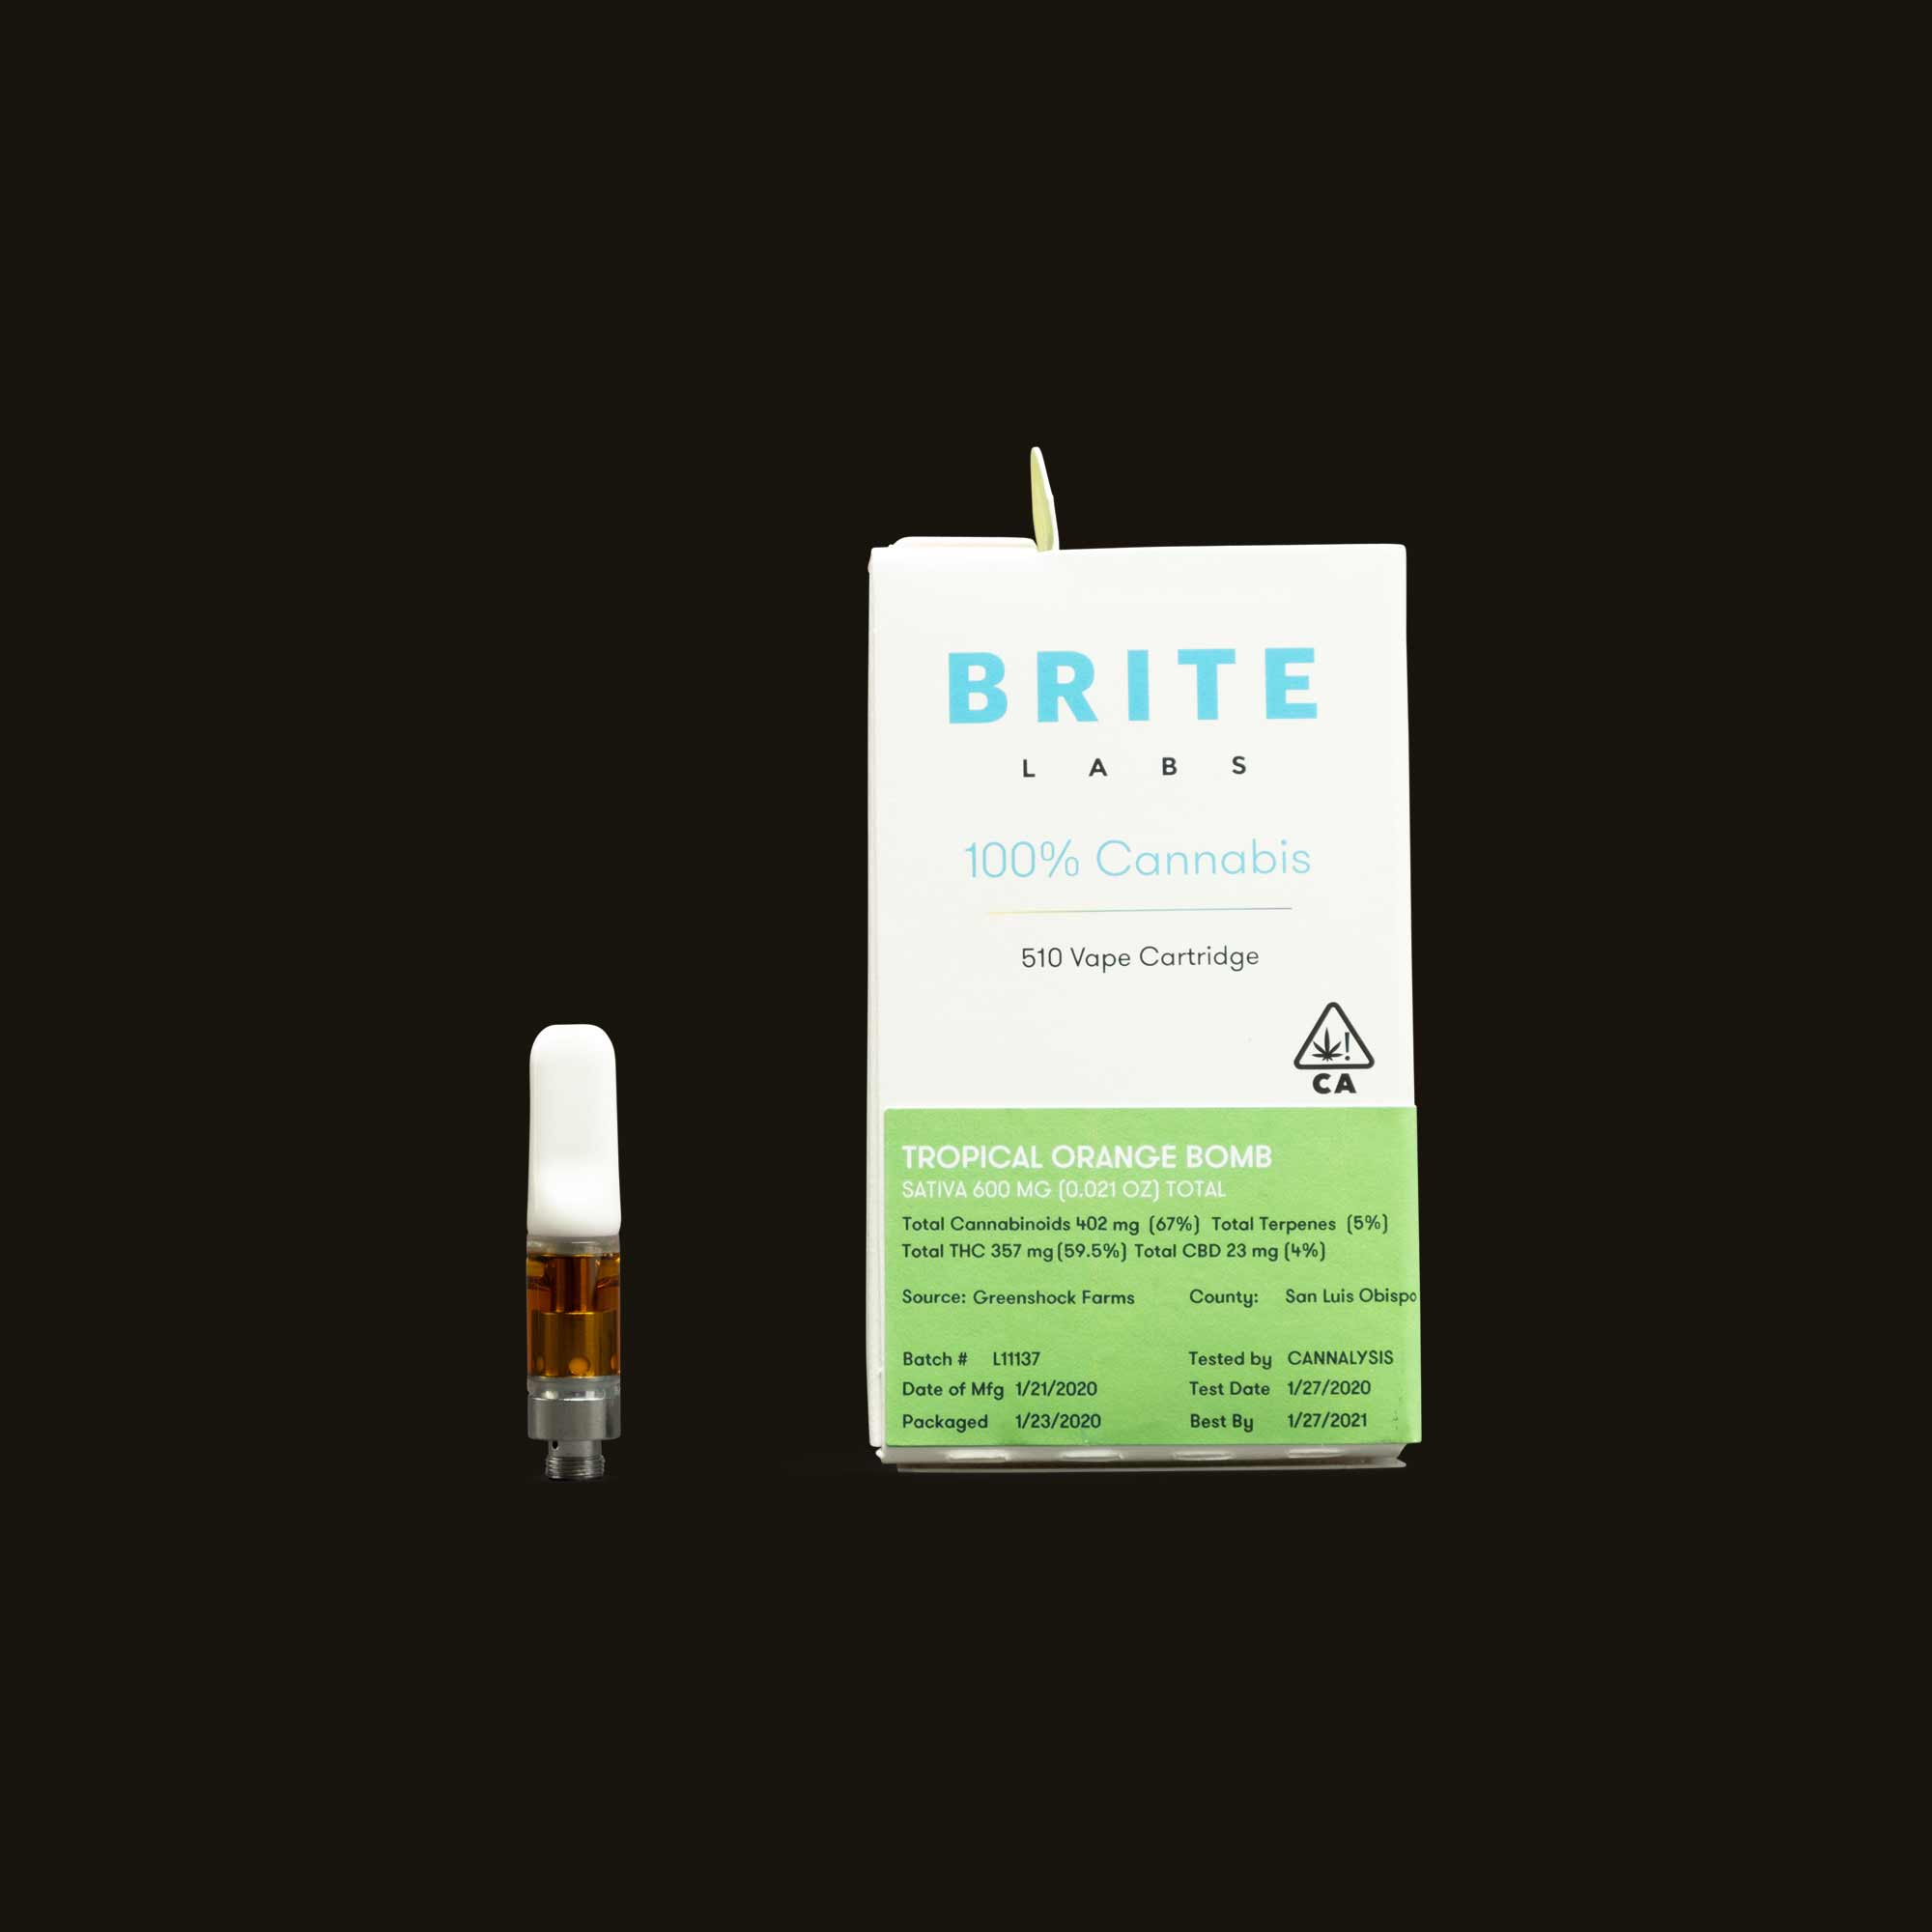 Brite Labs Tropical Orange Bomb Cartridge